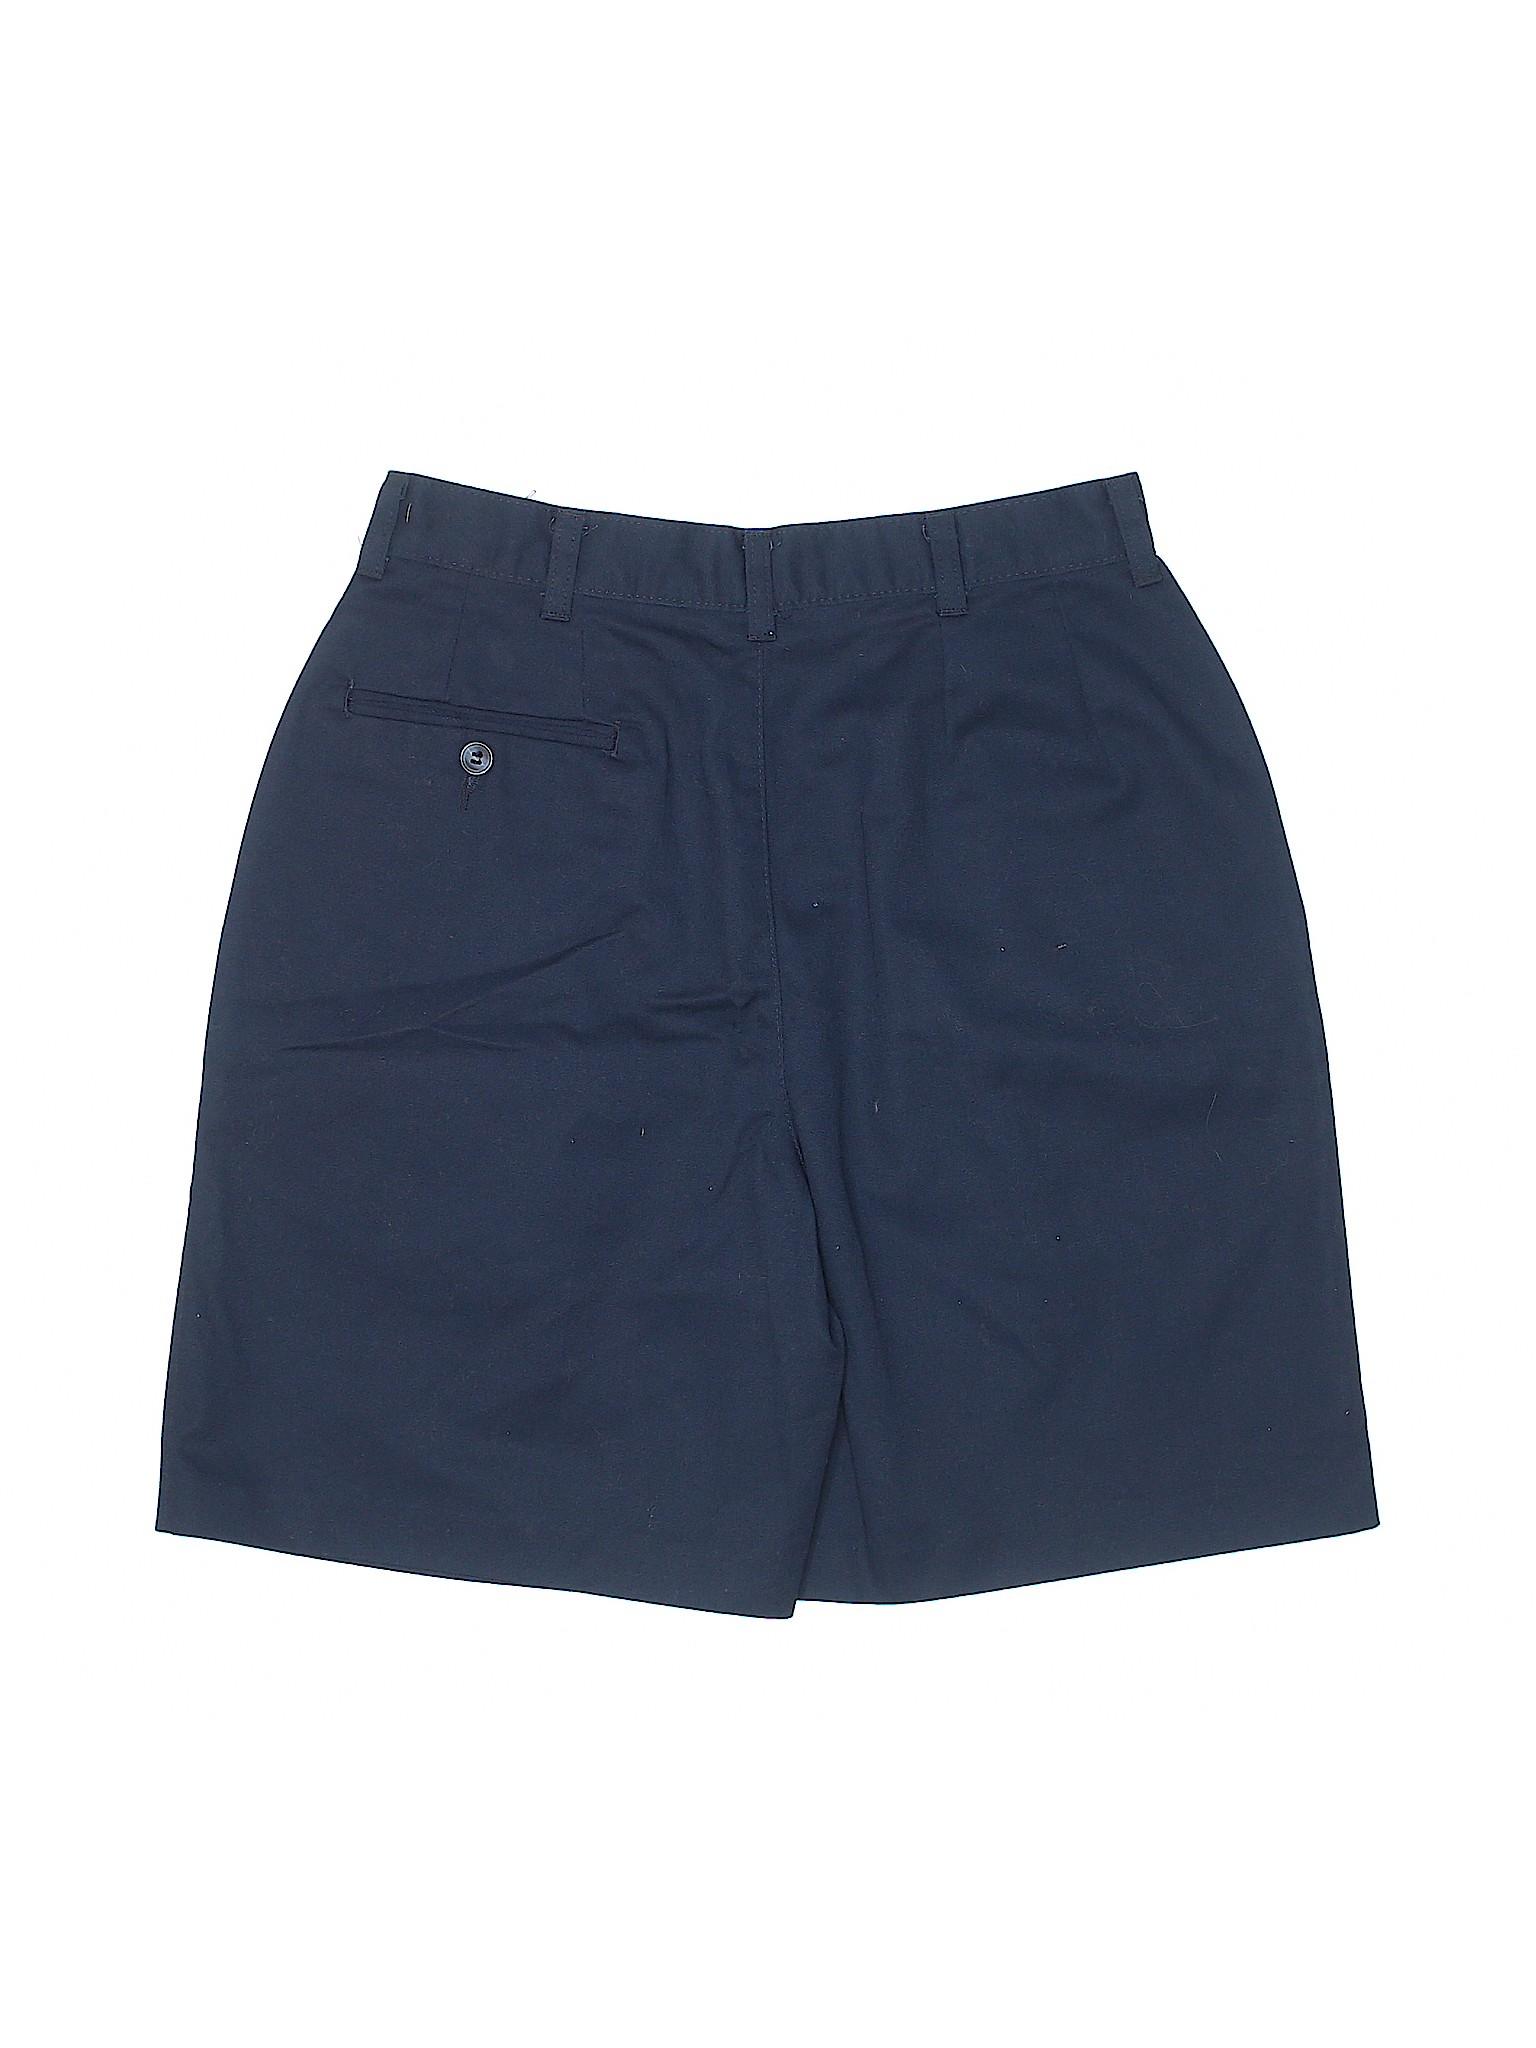 Khaki Garment Shorts Edward's Garment Boutique Edward's Khaki Boutique Shorts Boutique wCpZ0zIq